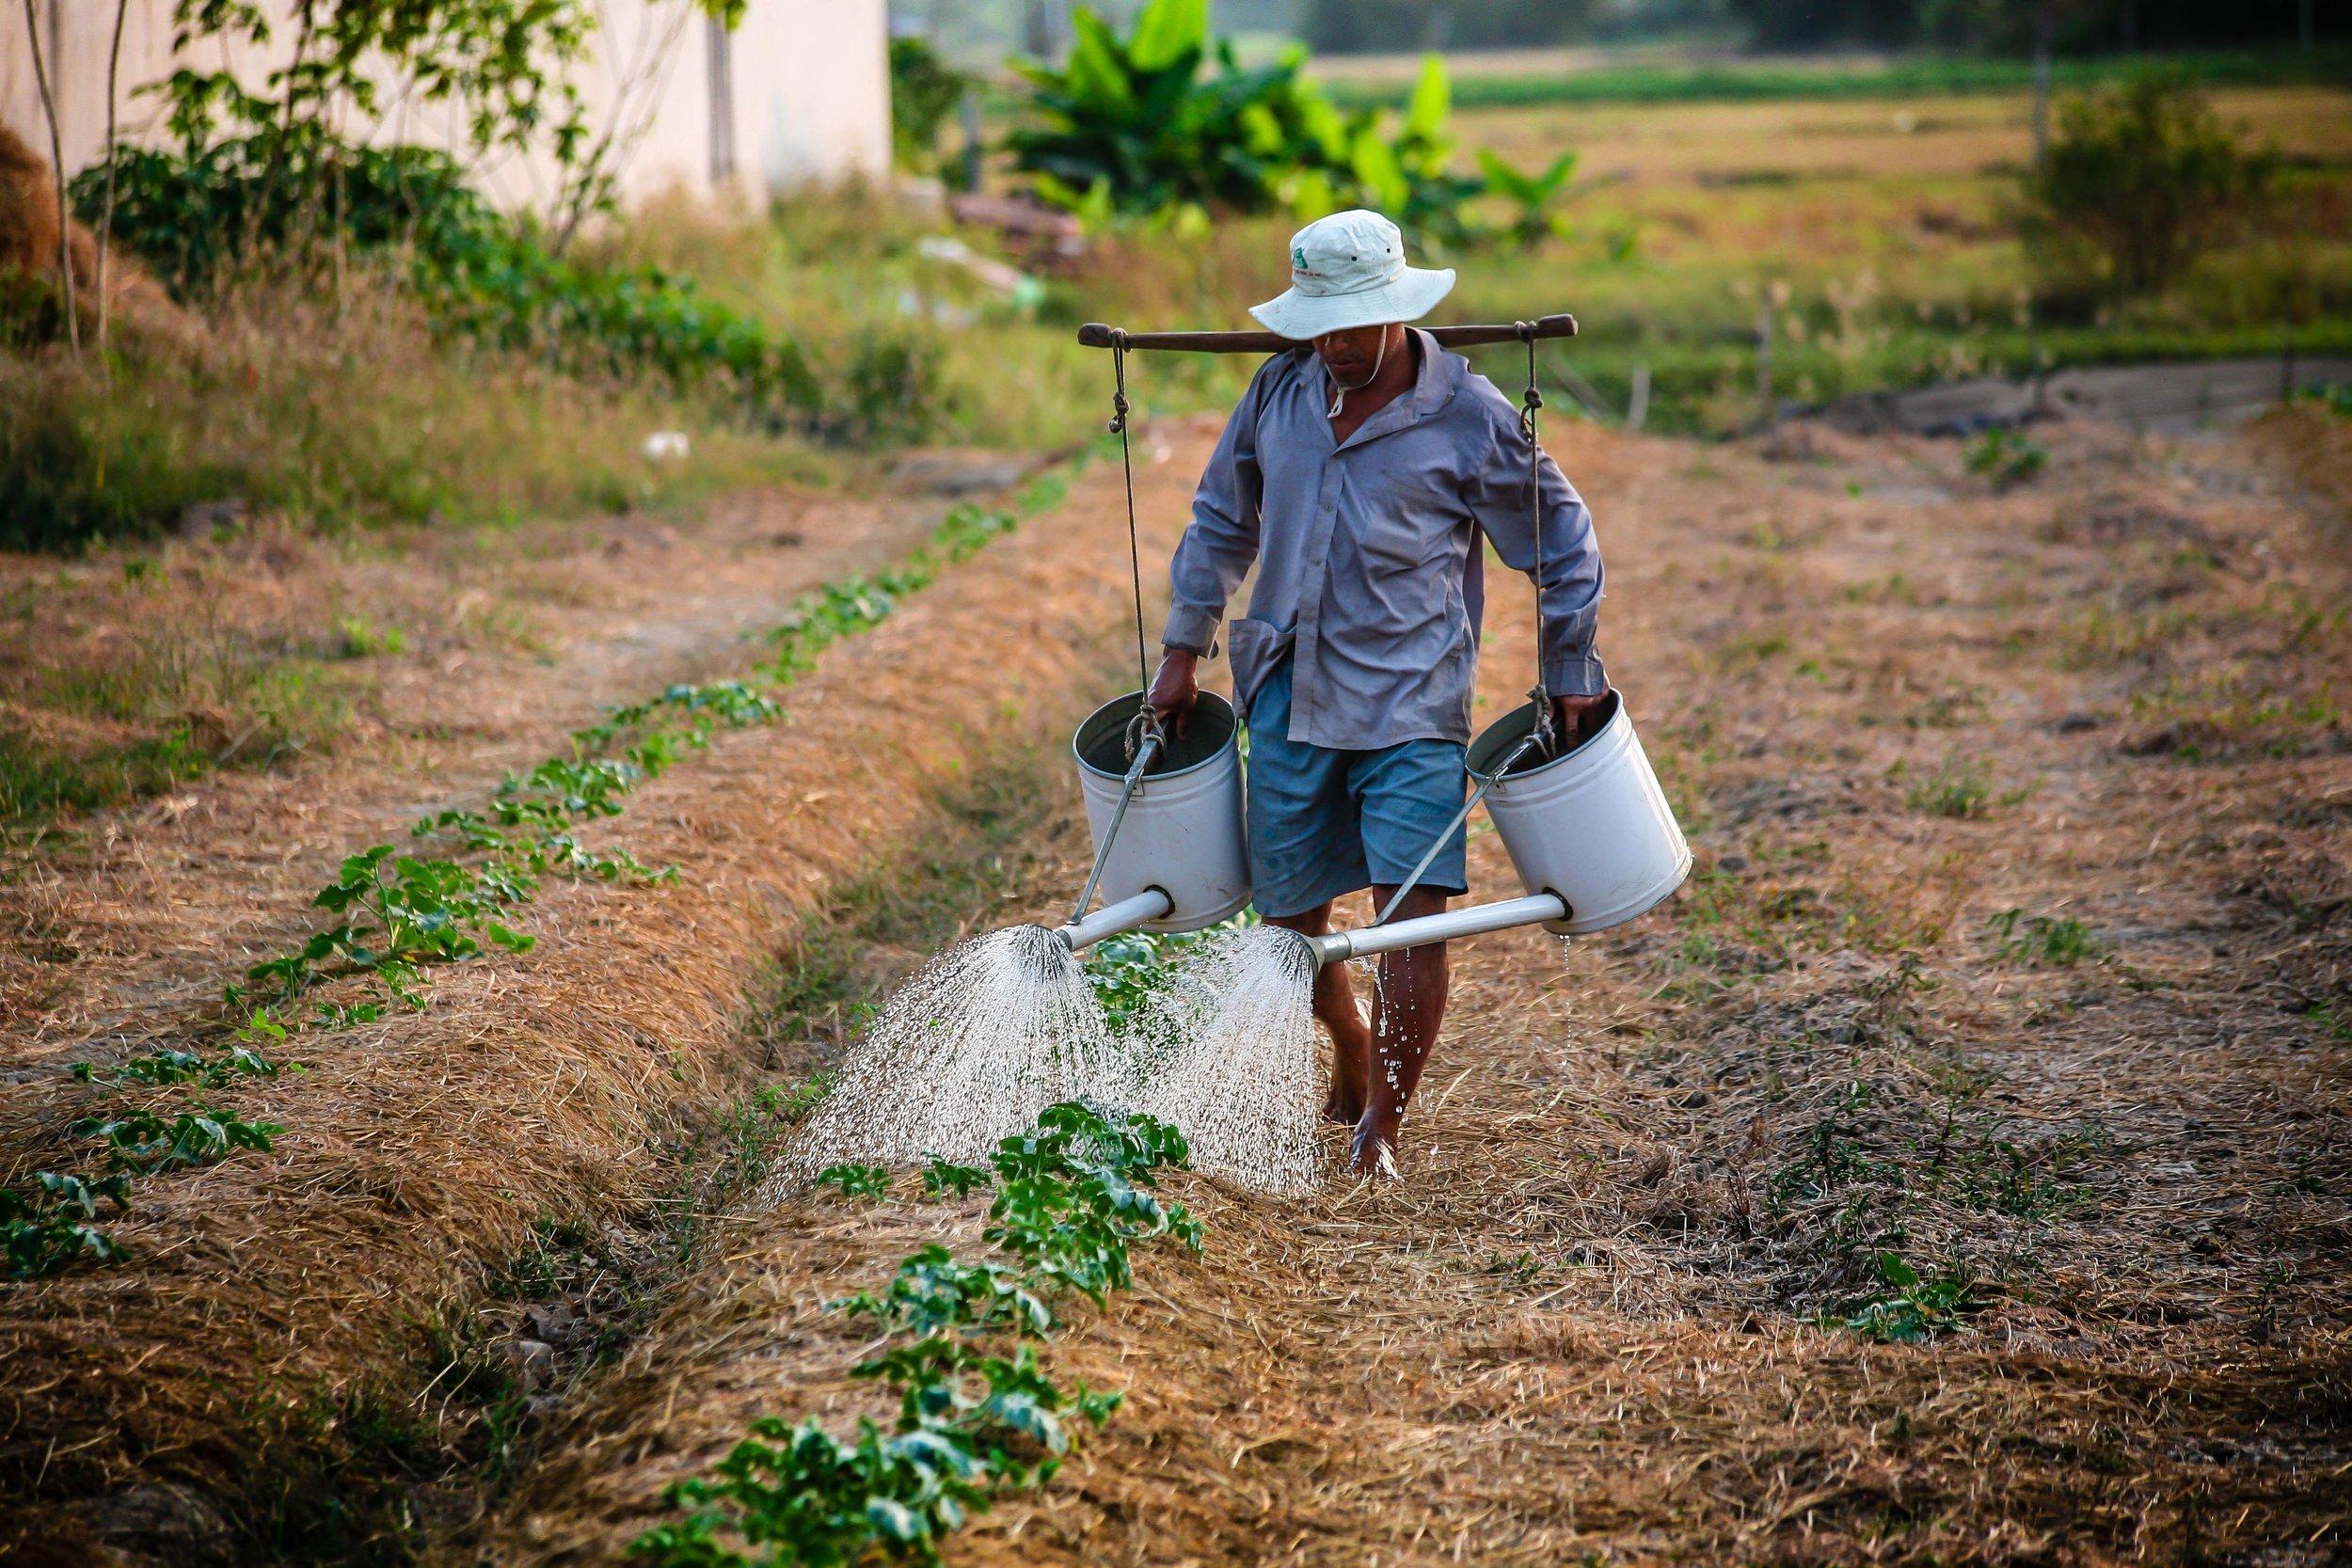 adult-agriculture-backyard-planting-162637.jpg